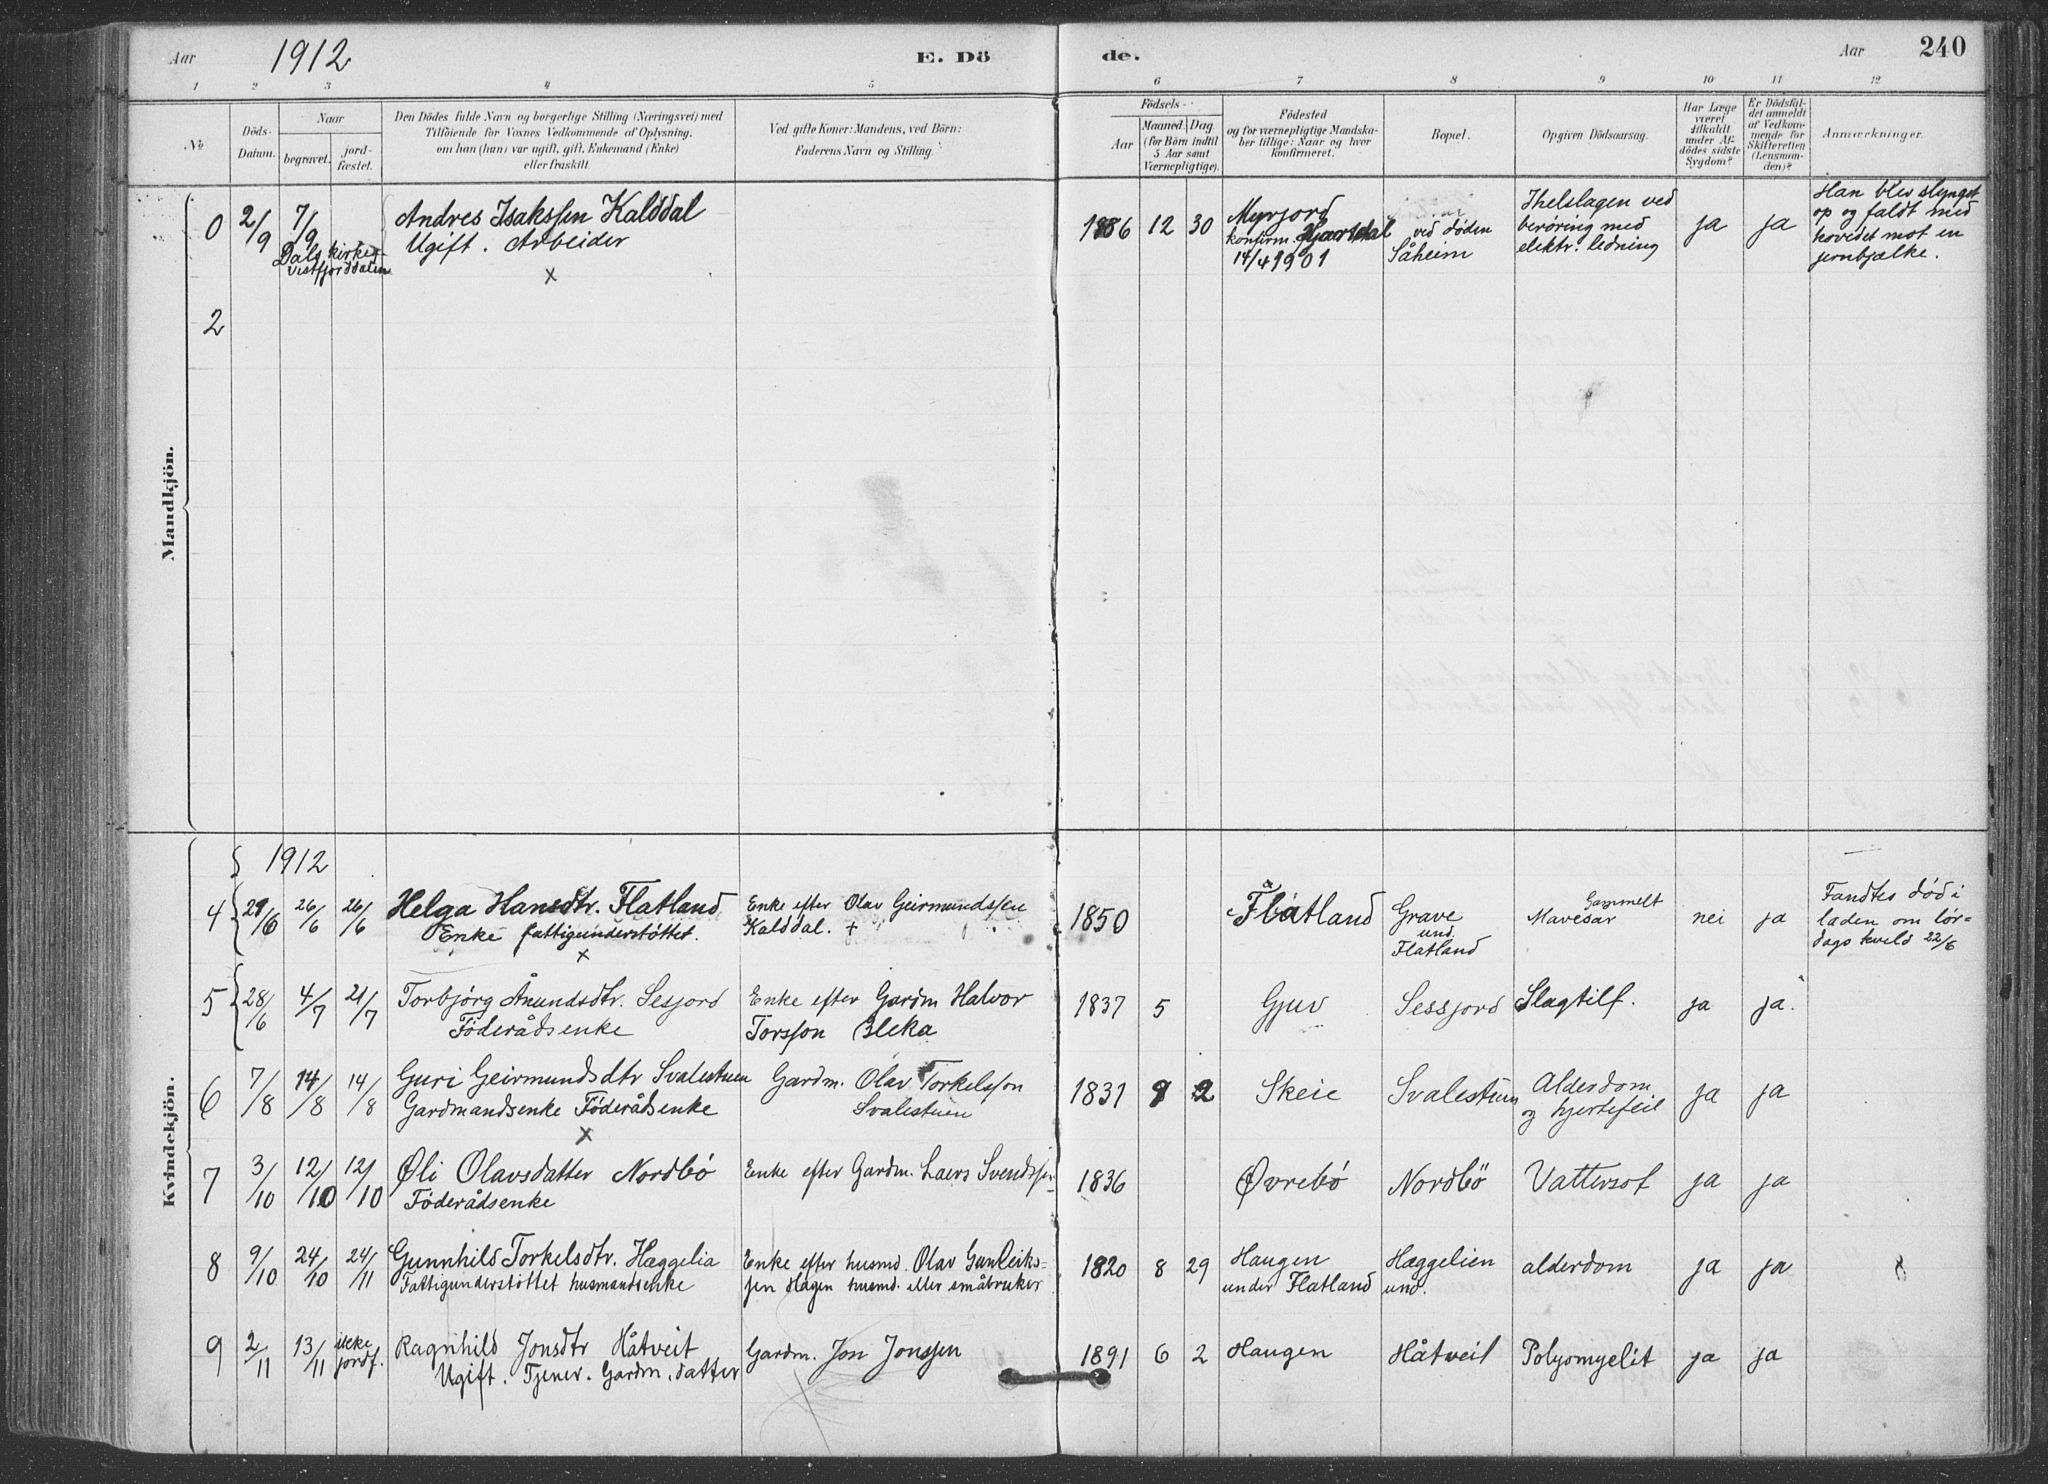 SAKO, Hjartdal kirkebøker, F/Fa/L0010: Ministerialbok nr. I 10, 1880-1929, s. 240